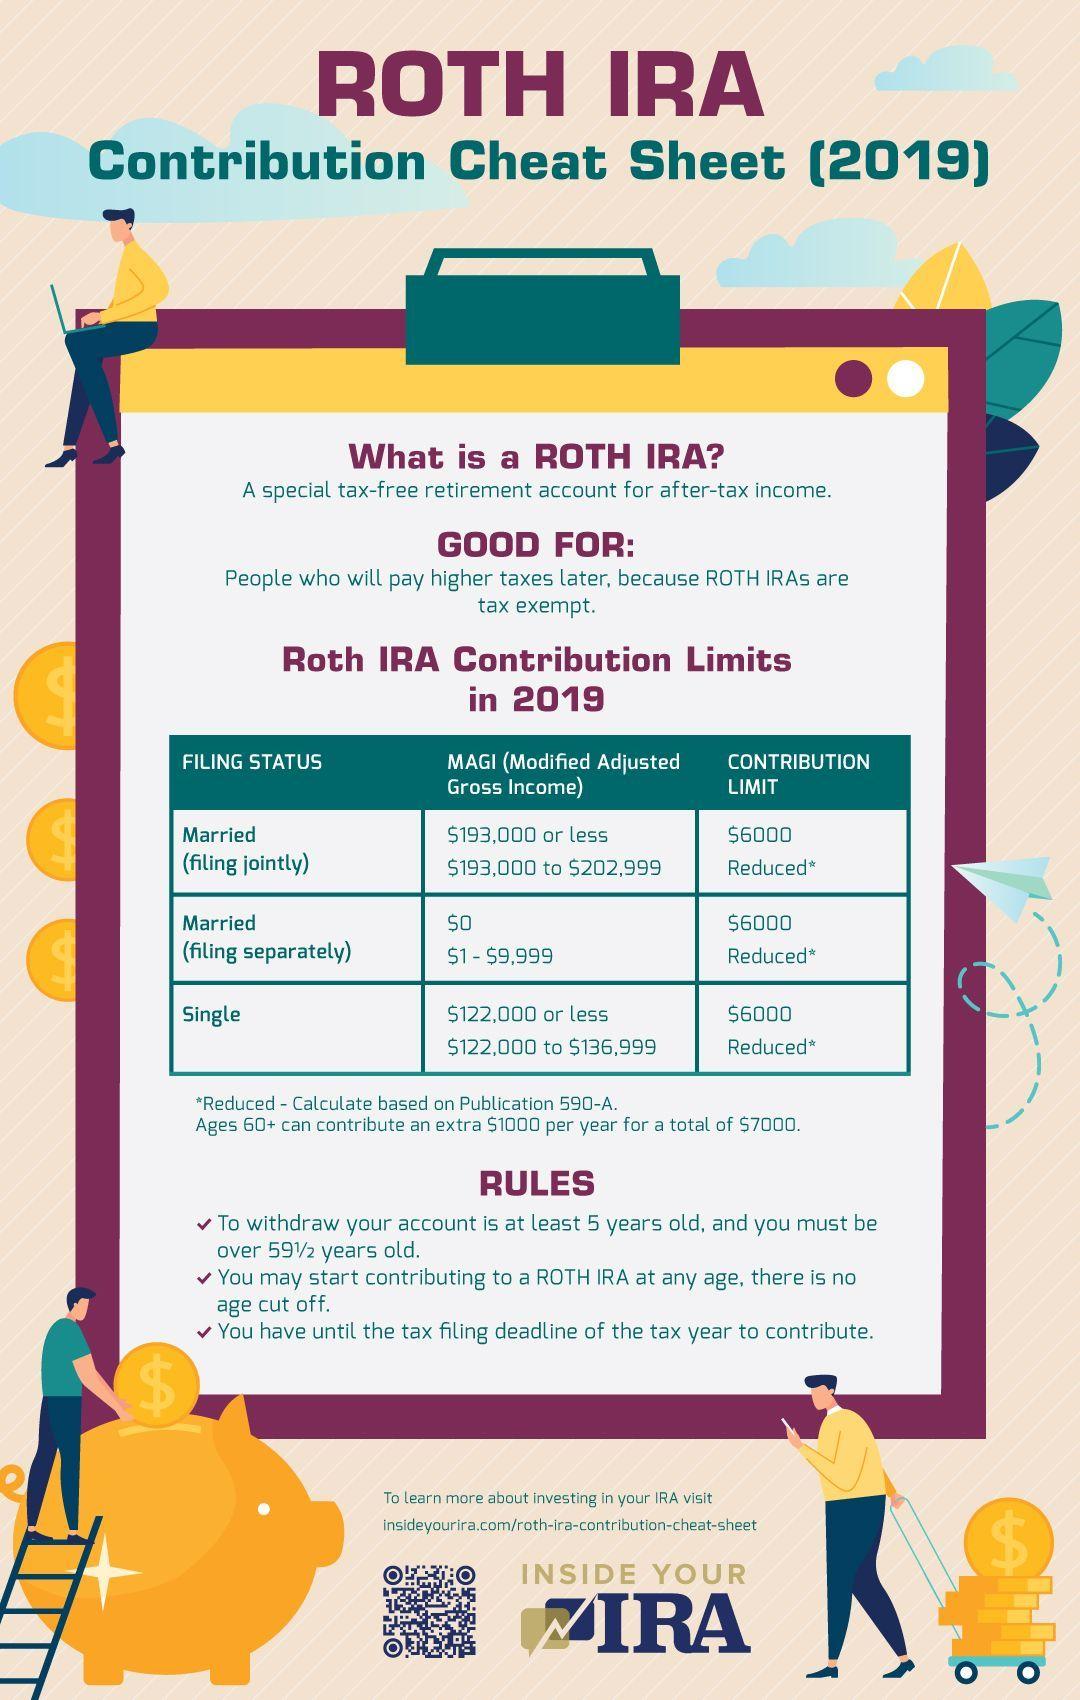 Roth Ira Contribution Cheat Sheet Infographic Inside Your Ira Roth Ira Contributions Roth Ira Roth Ira Investing